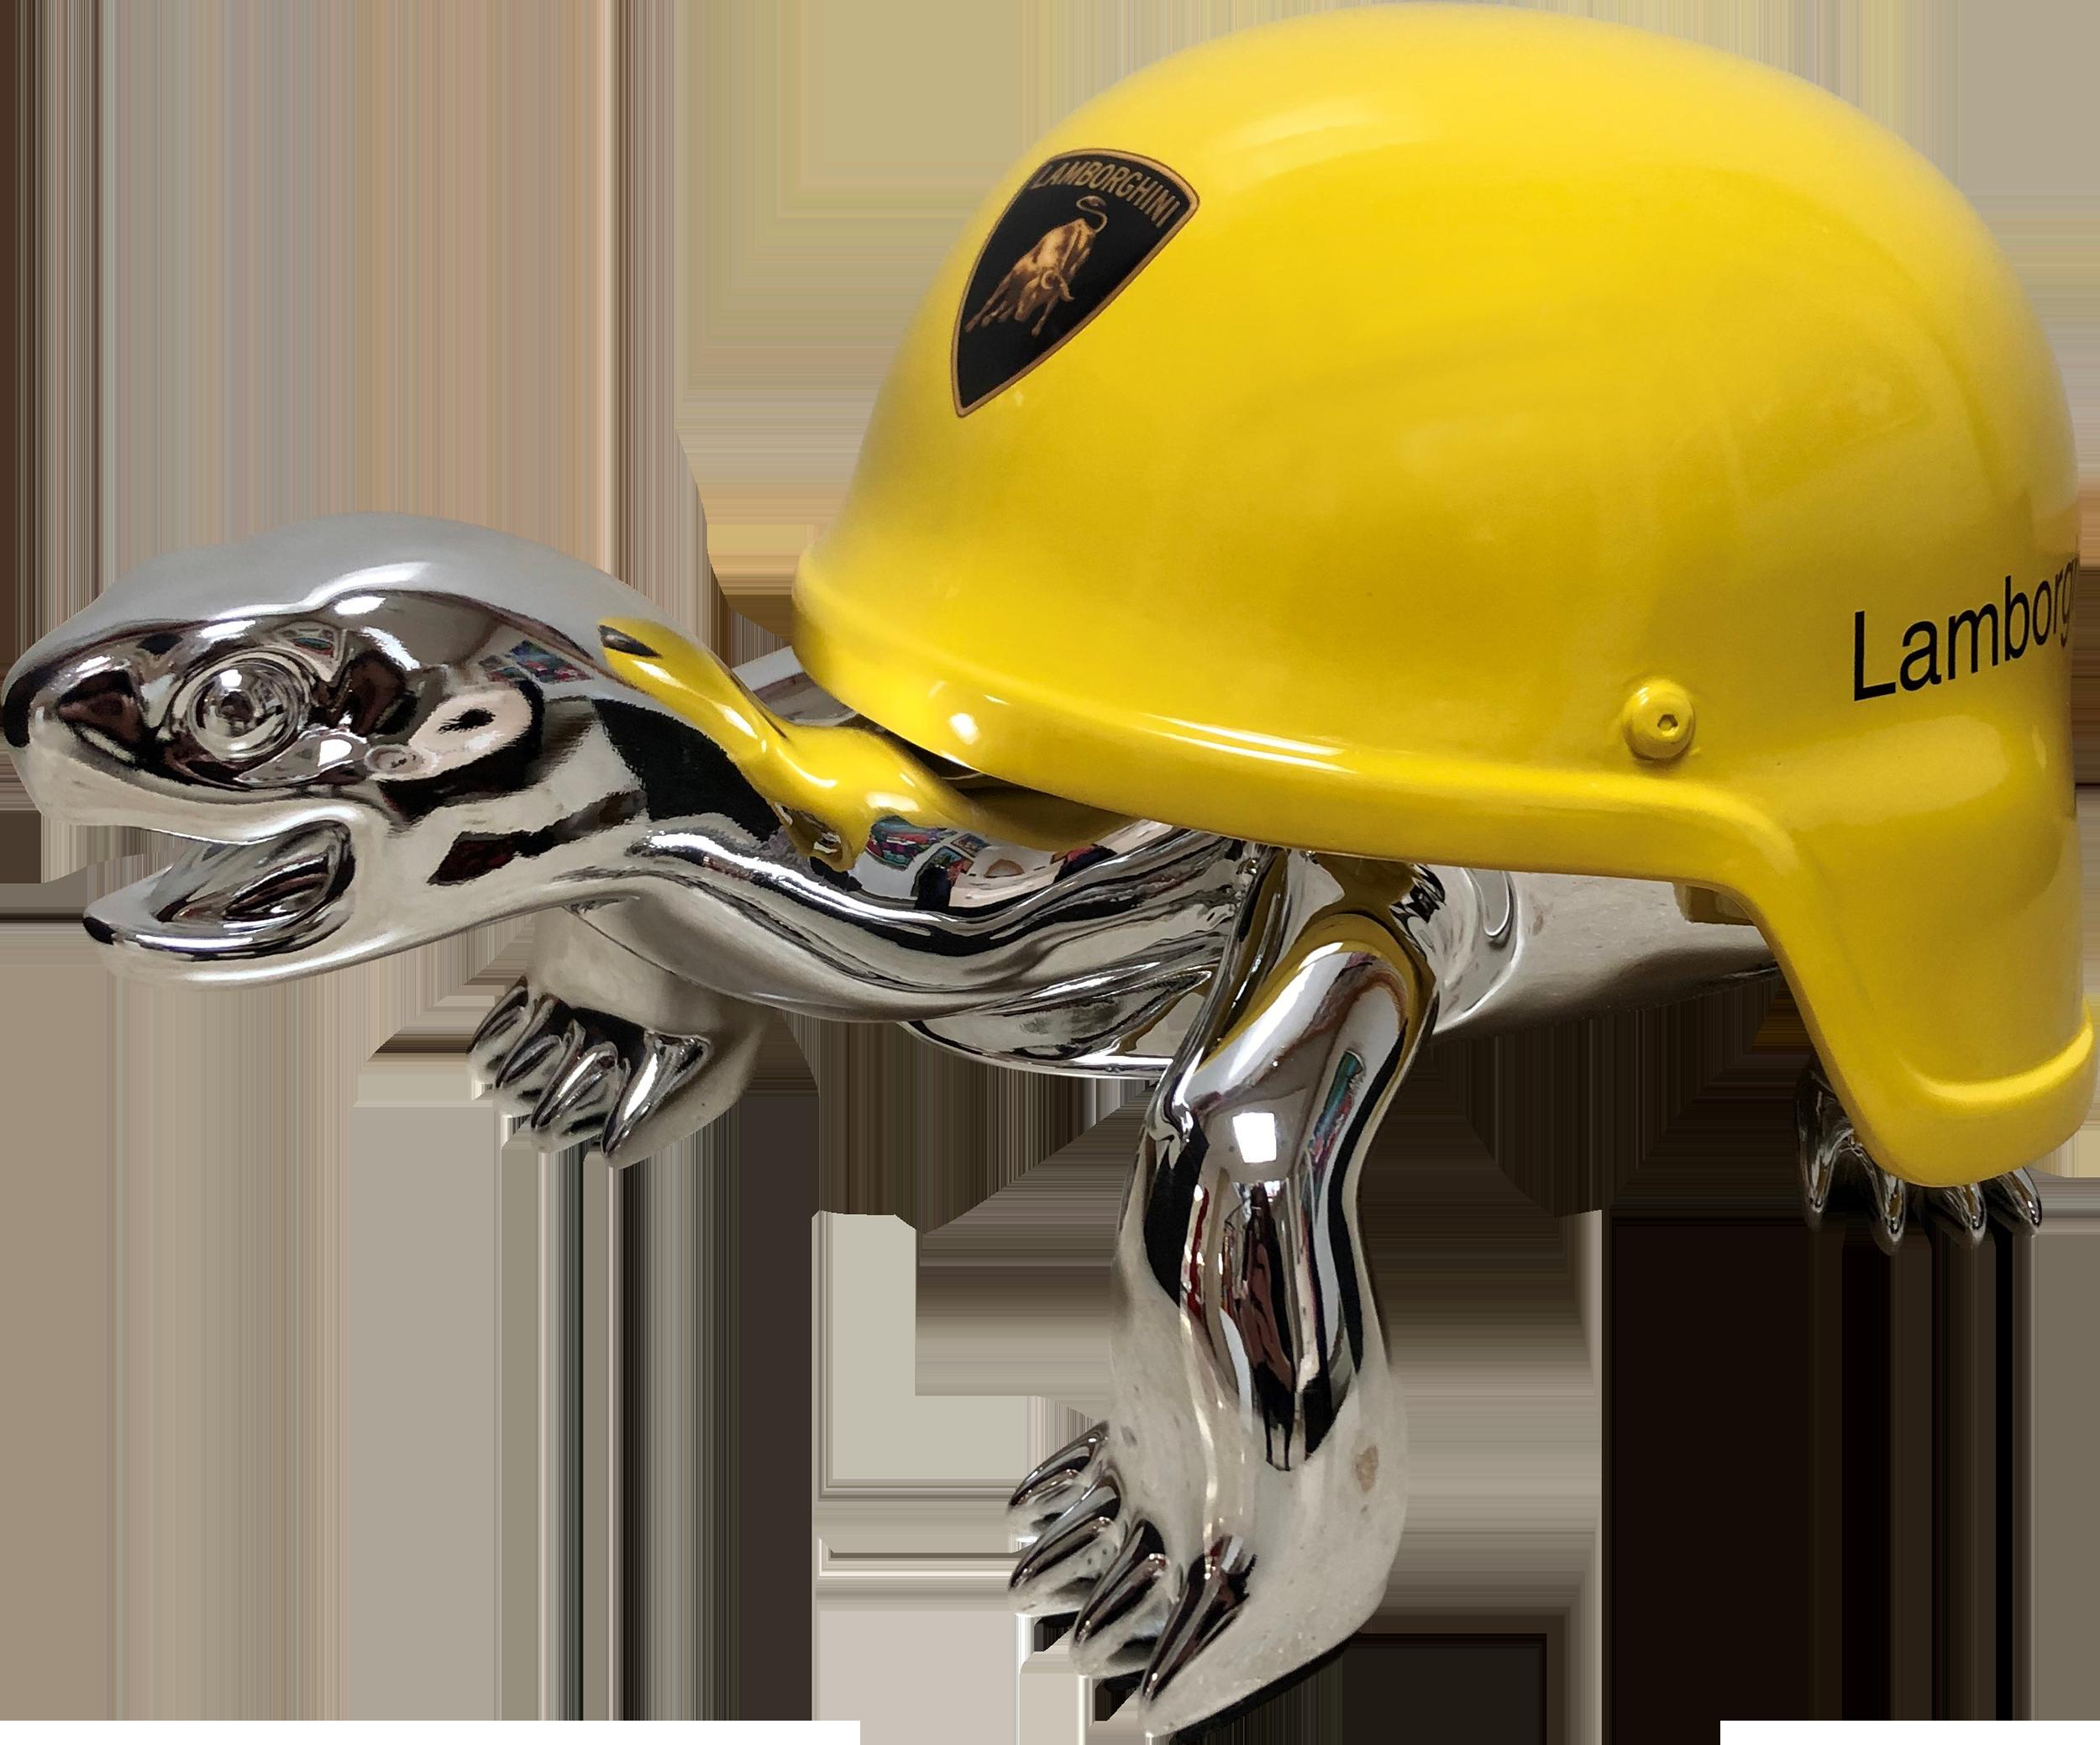 Diederik - Turtle (Silver Peace Lamborghini) , 4504-011-033